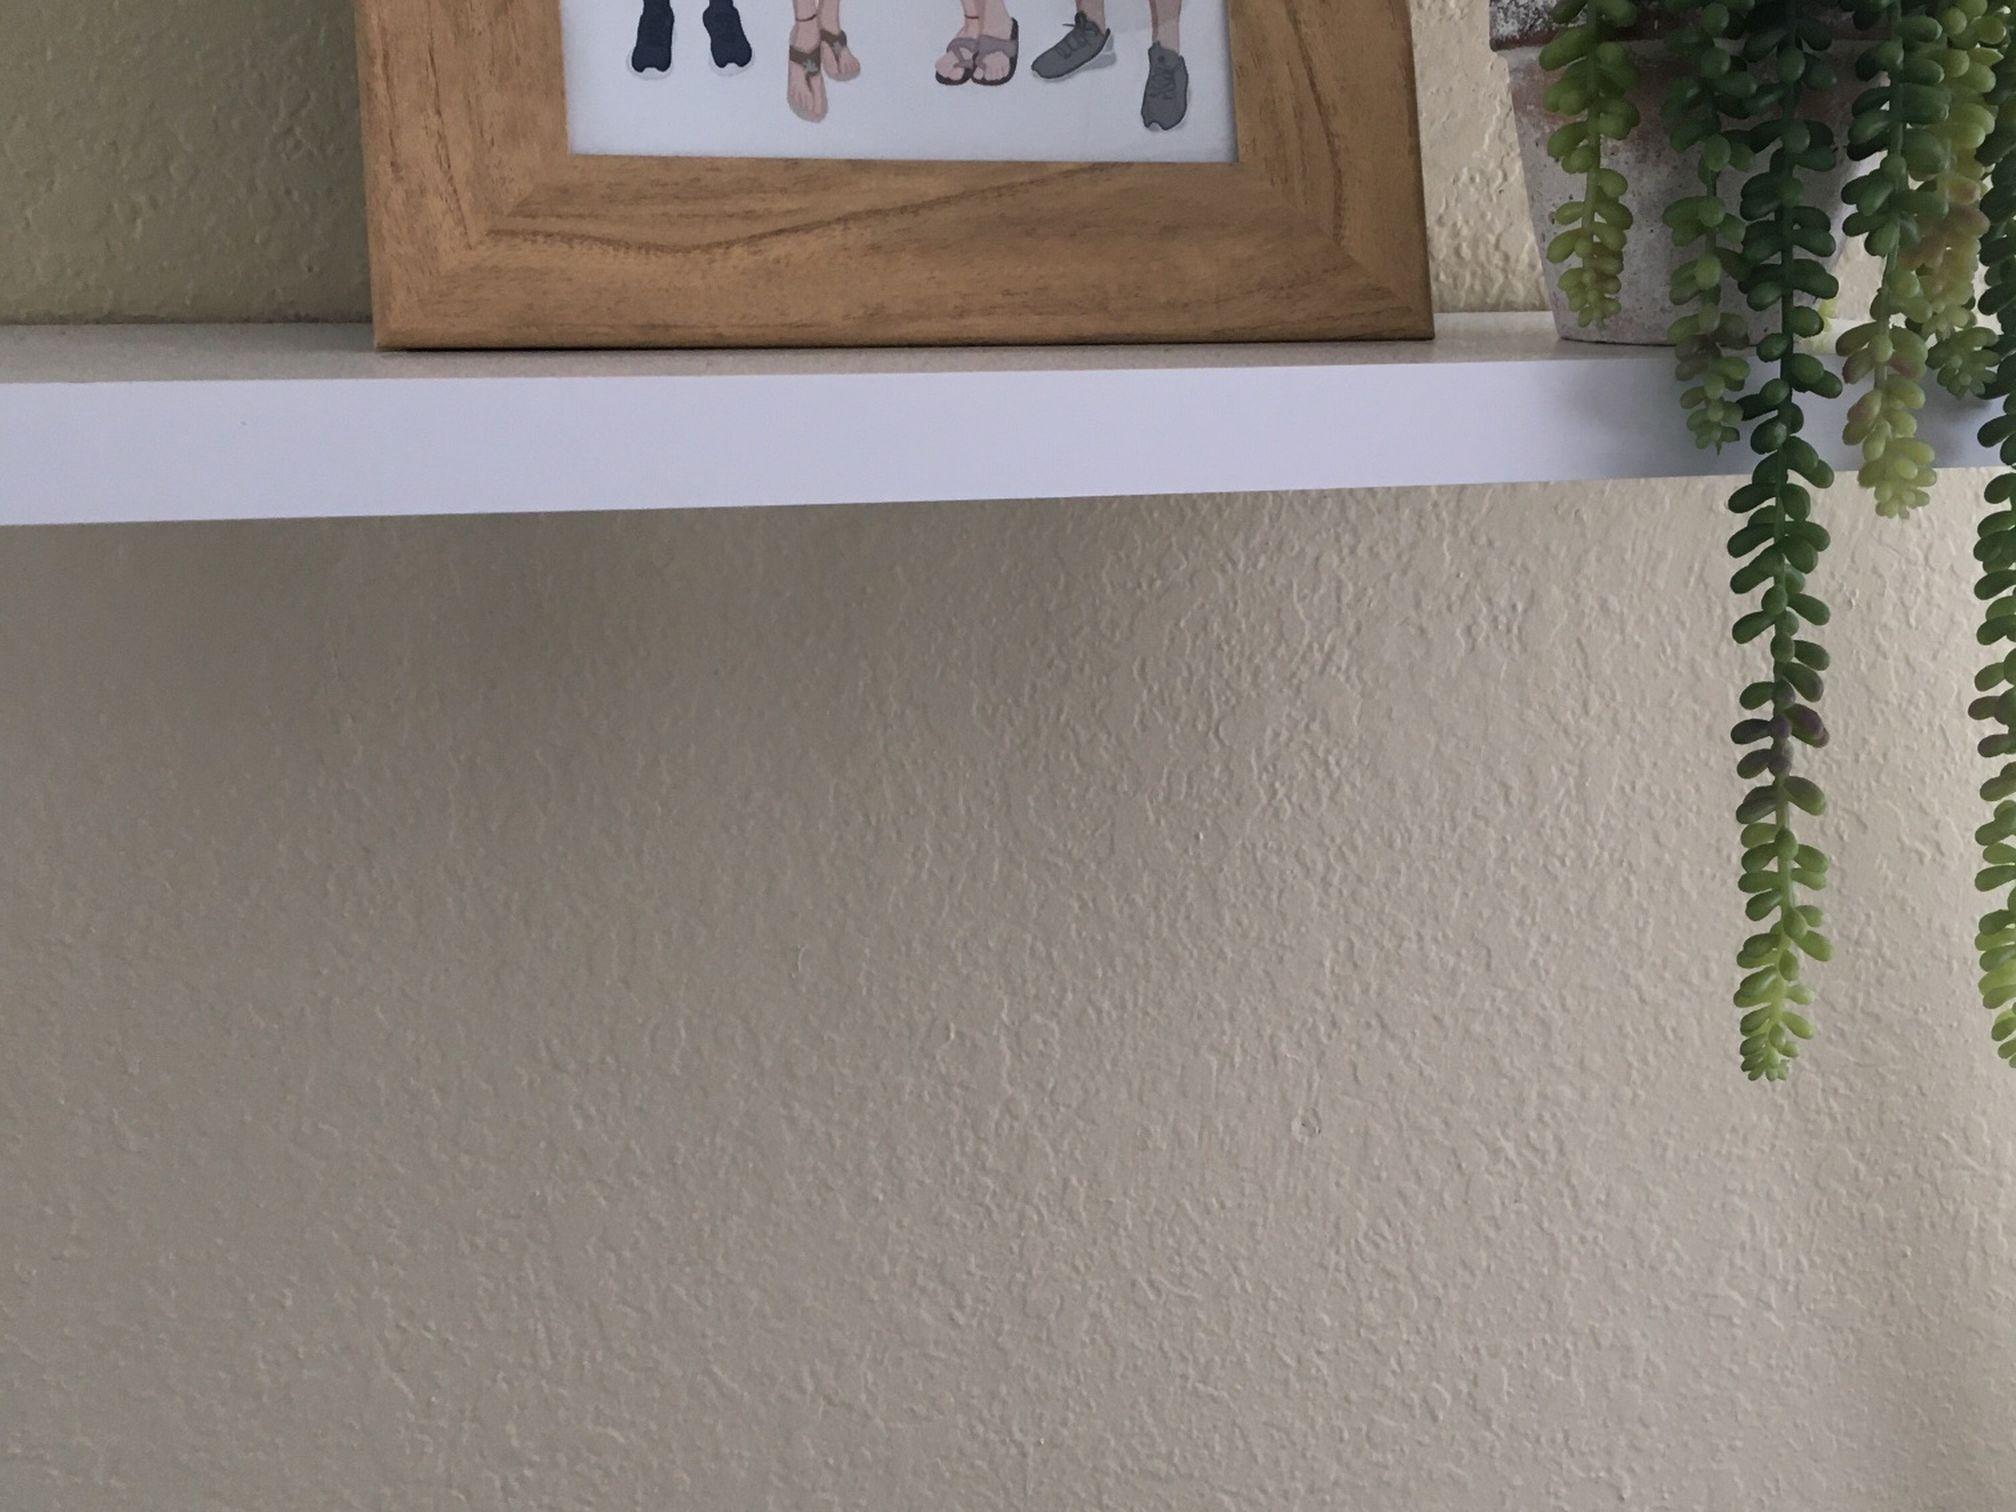 White Wood No Bracket Hanging Shelf